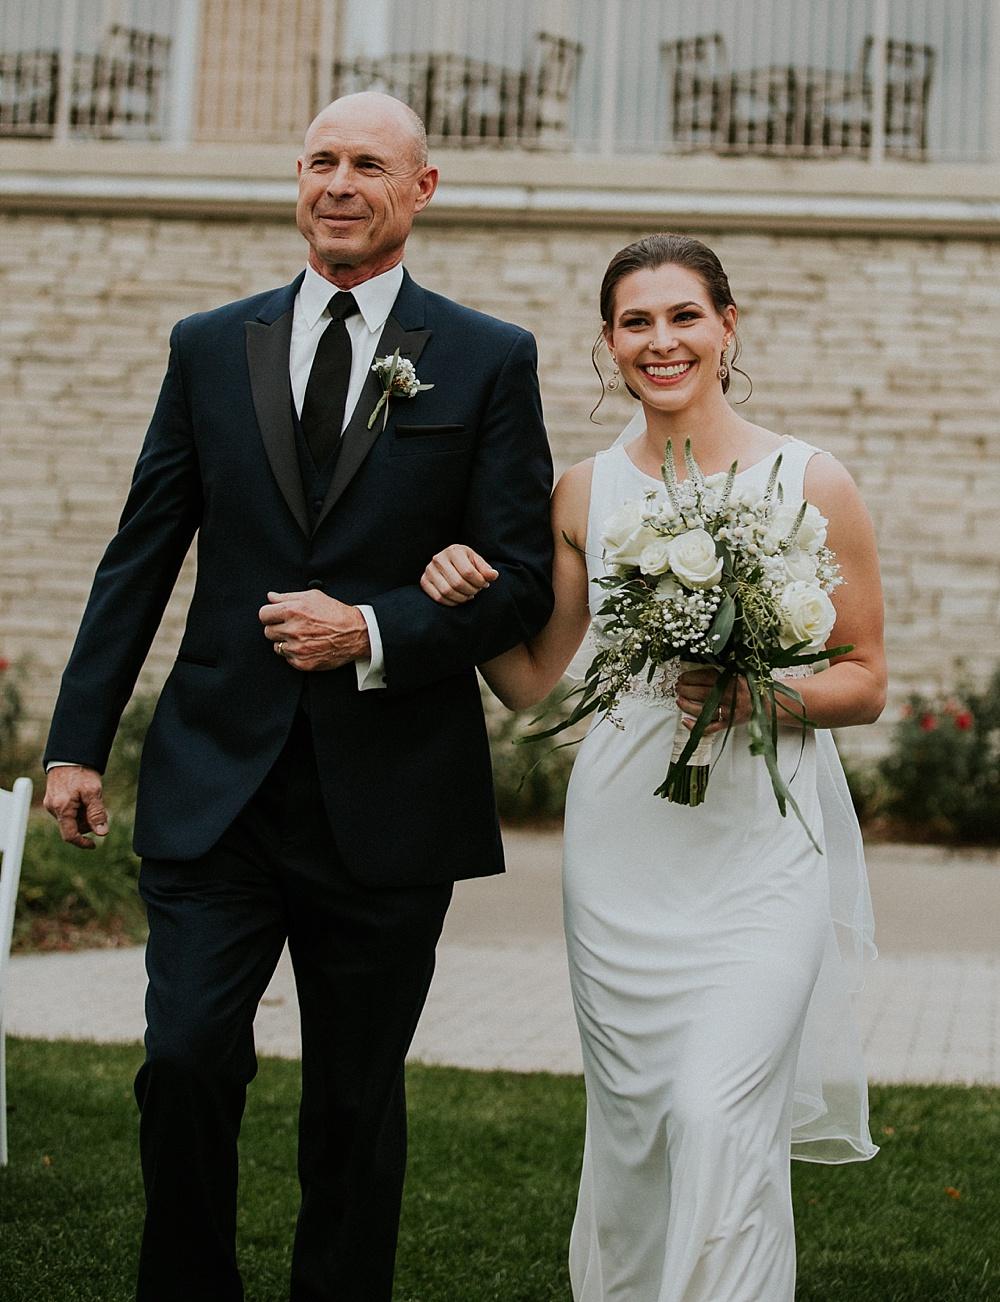 Mike-Stephanie_chicago_wedding_liller-photo-00028.jpg